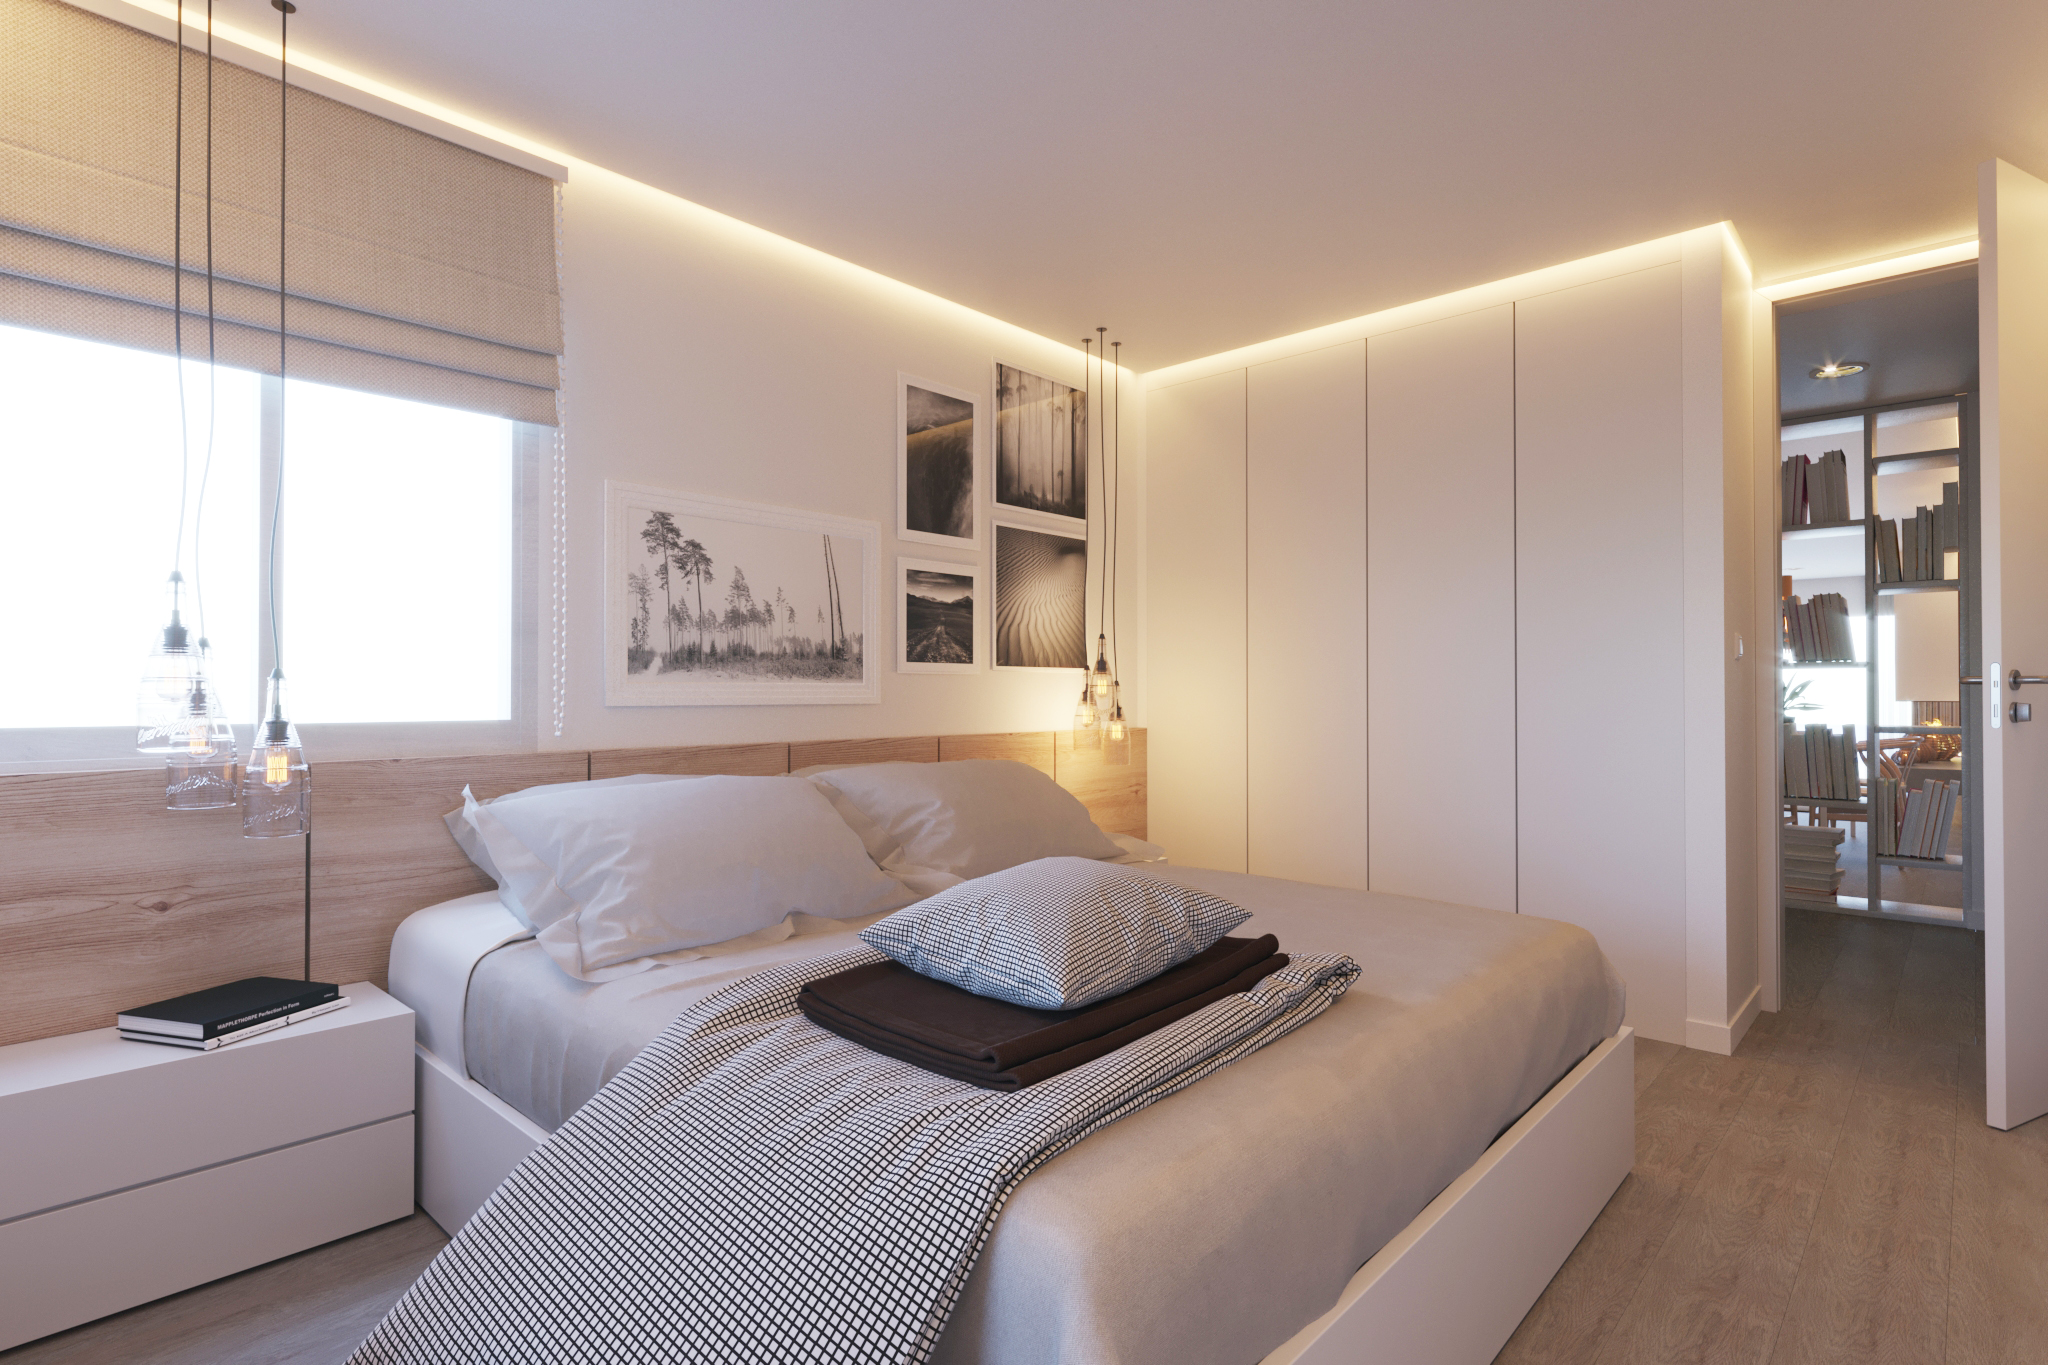 006-Dormitorio